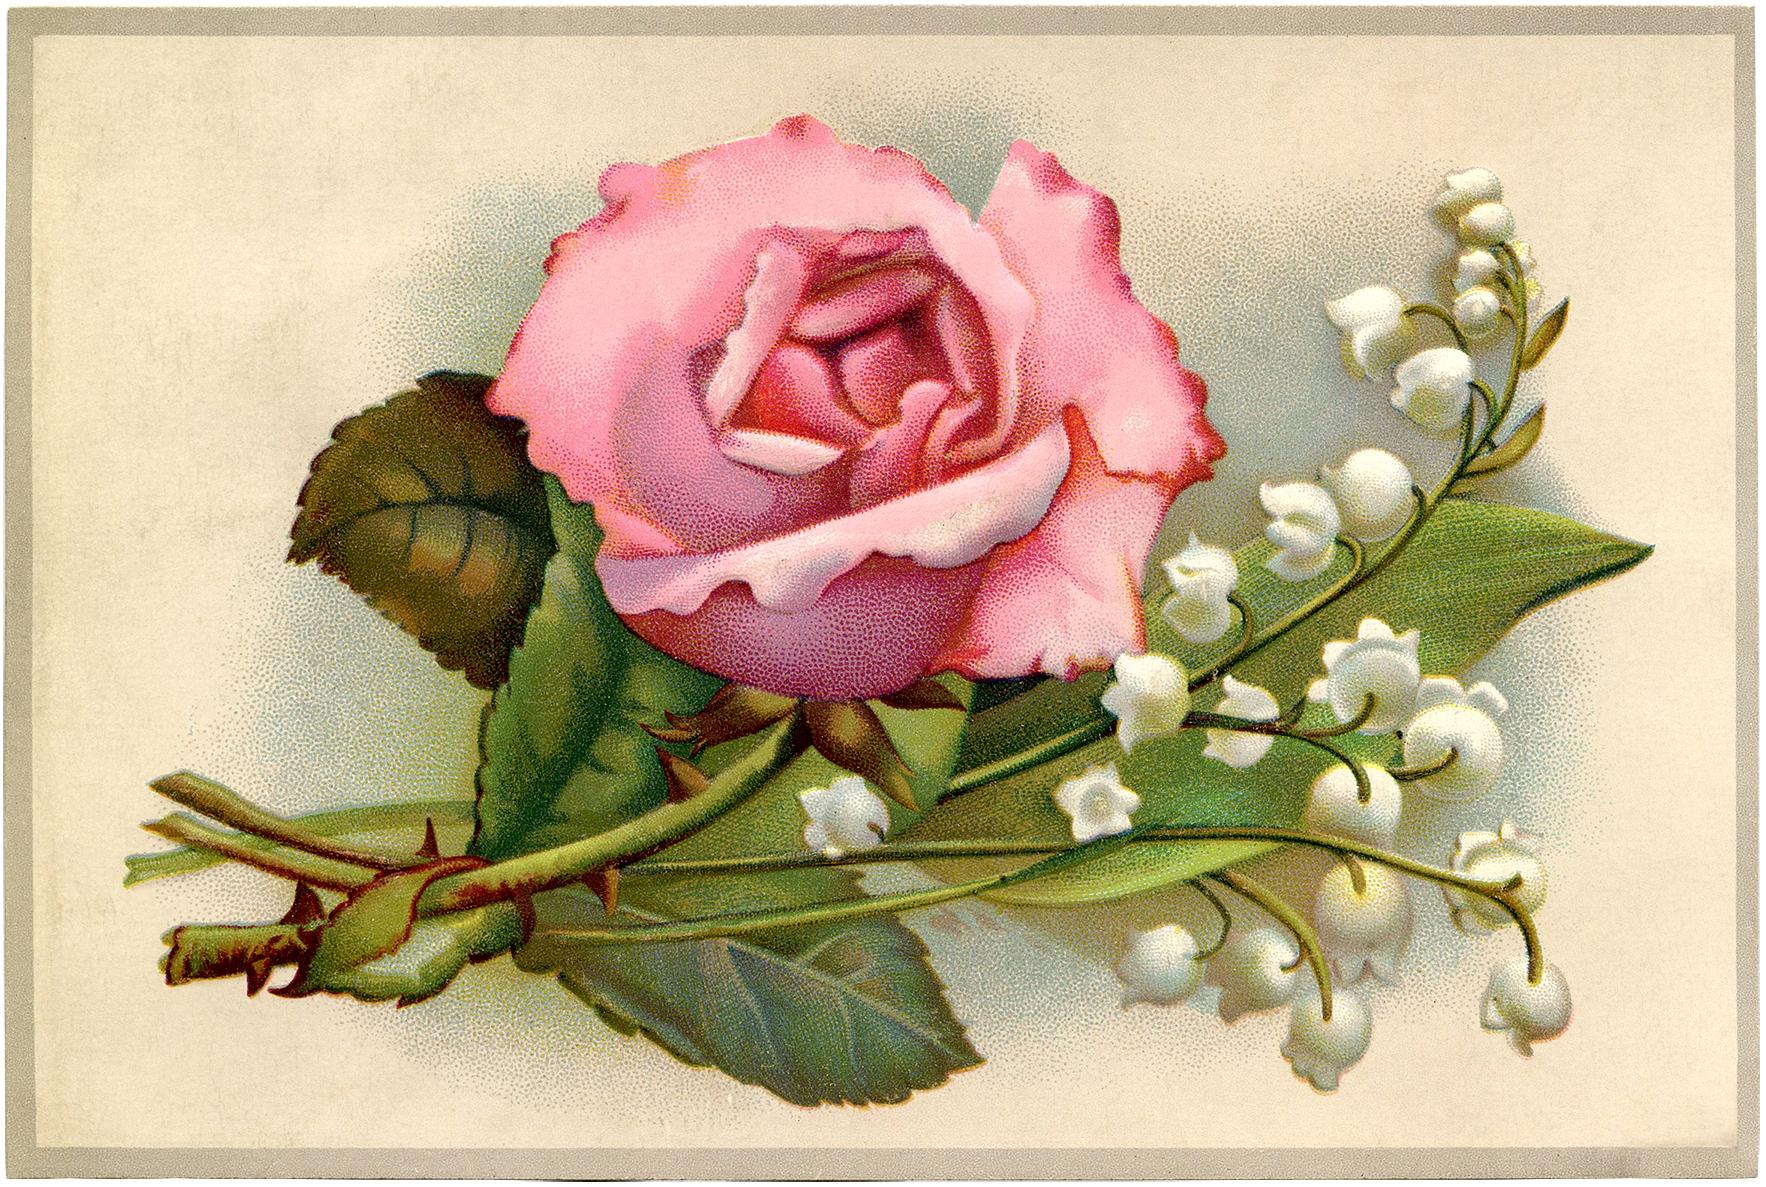 floral wallpaper vintage rose - HD Desktop Wallpapers   4k HD